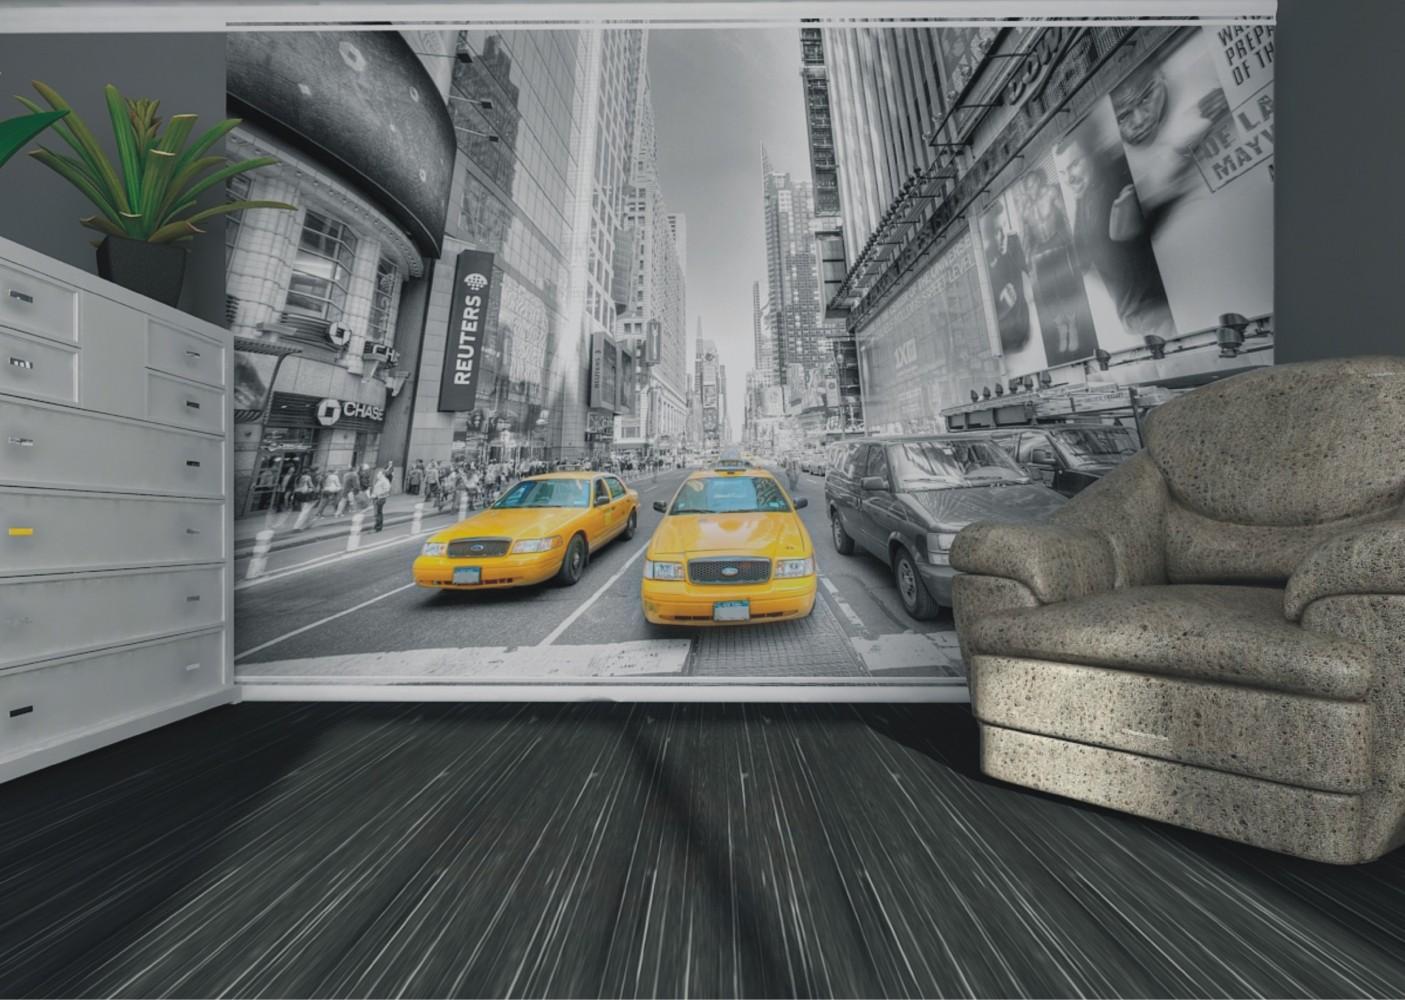 wall mural wallpaper new york taxi yellow cap manhattan. Black Bedroom Furniture Sets. Home Design Ideas